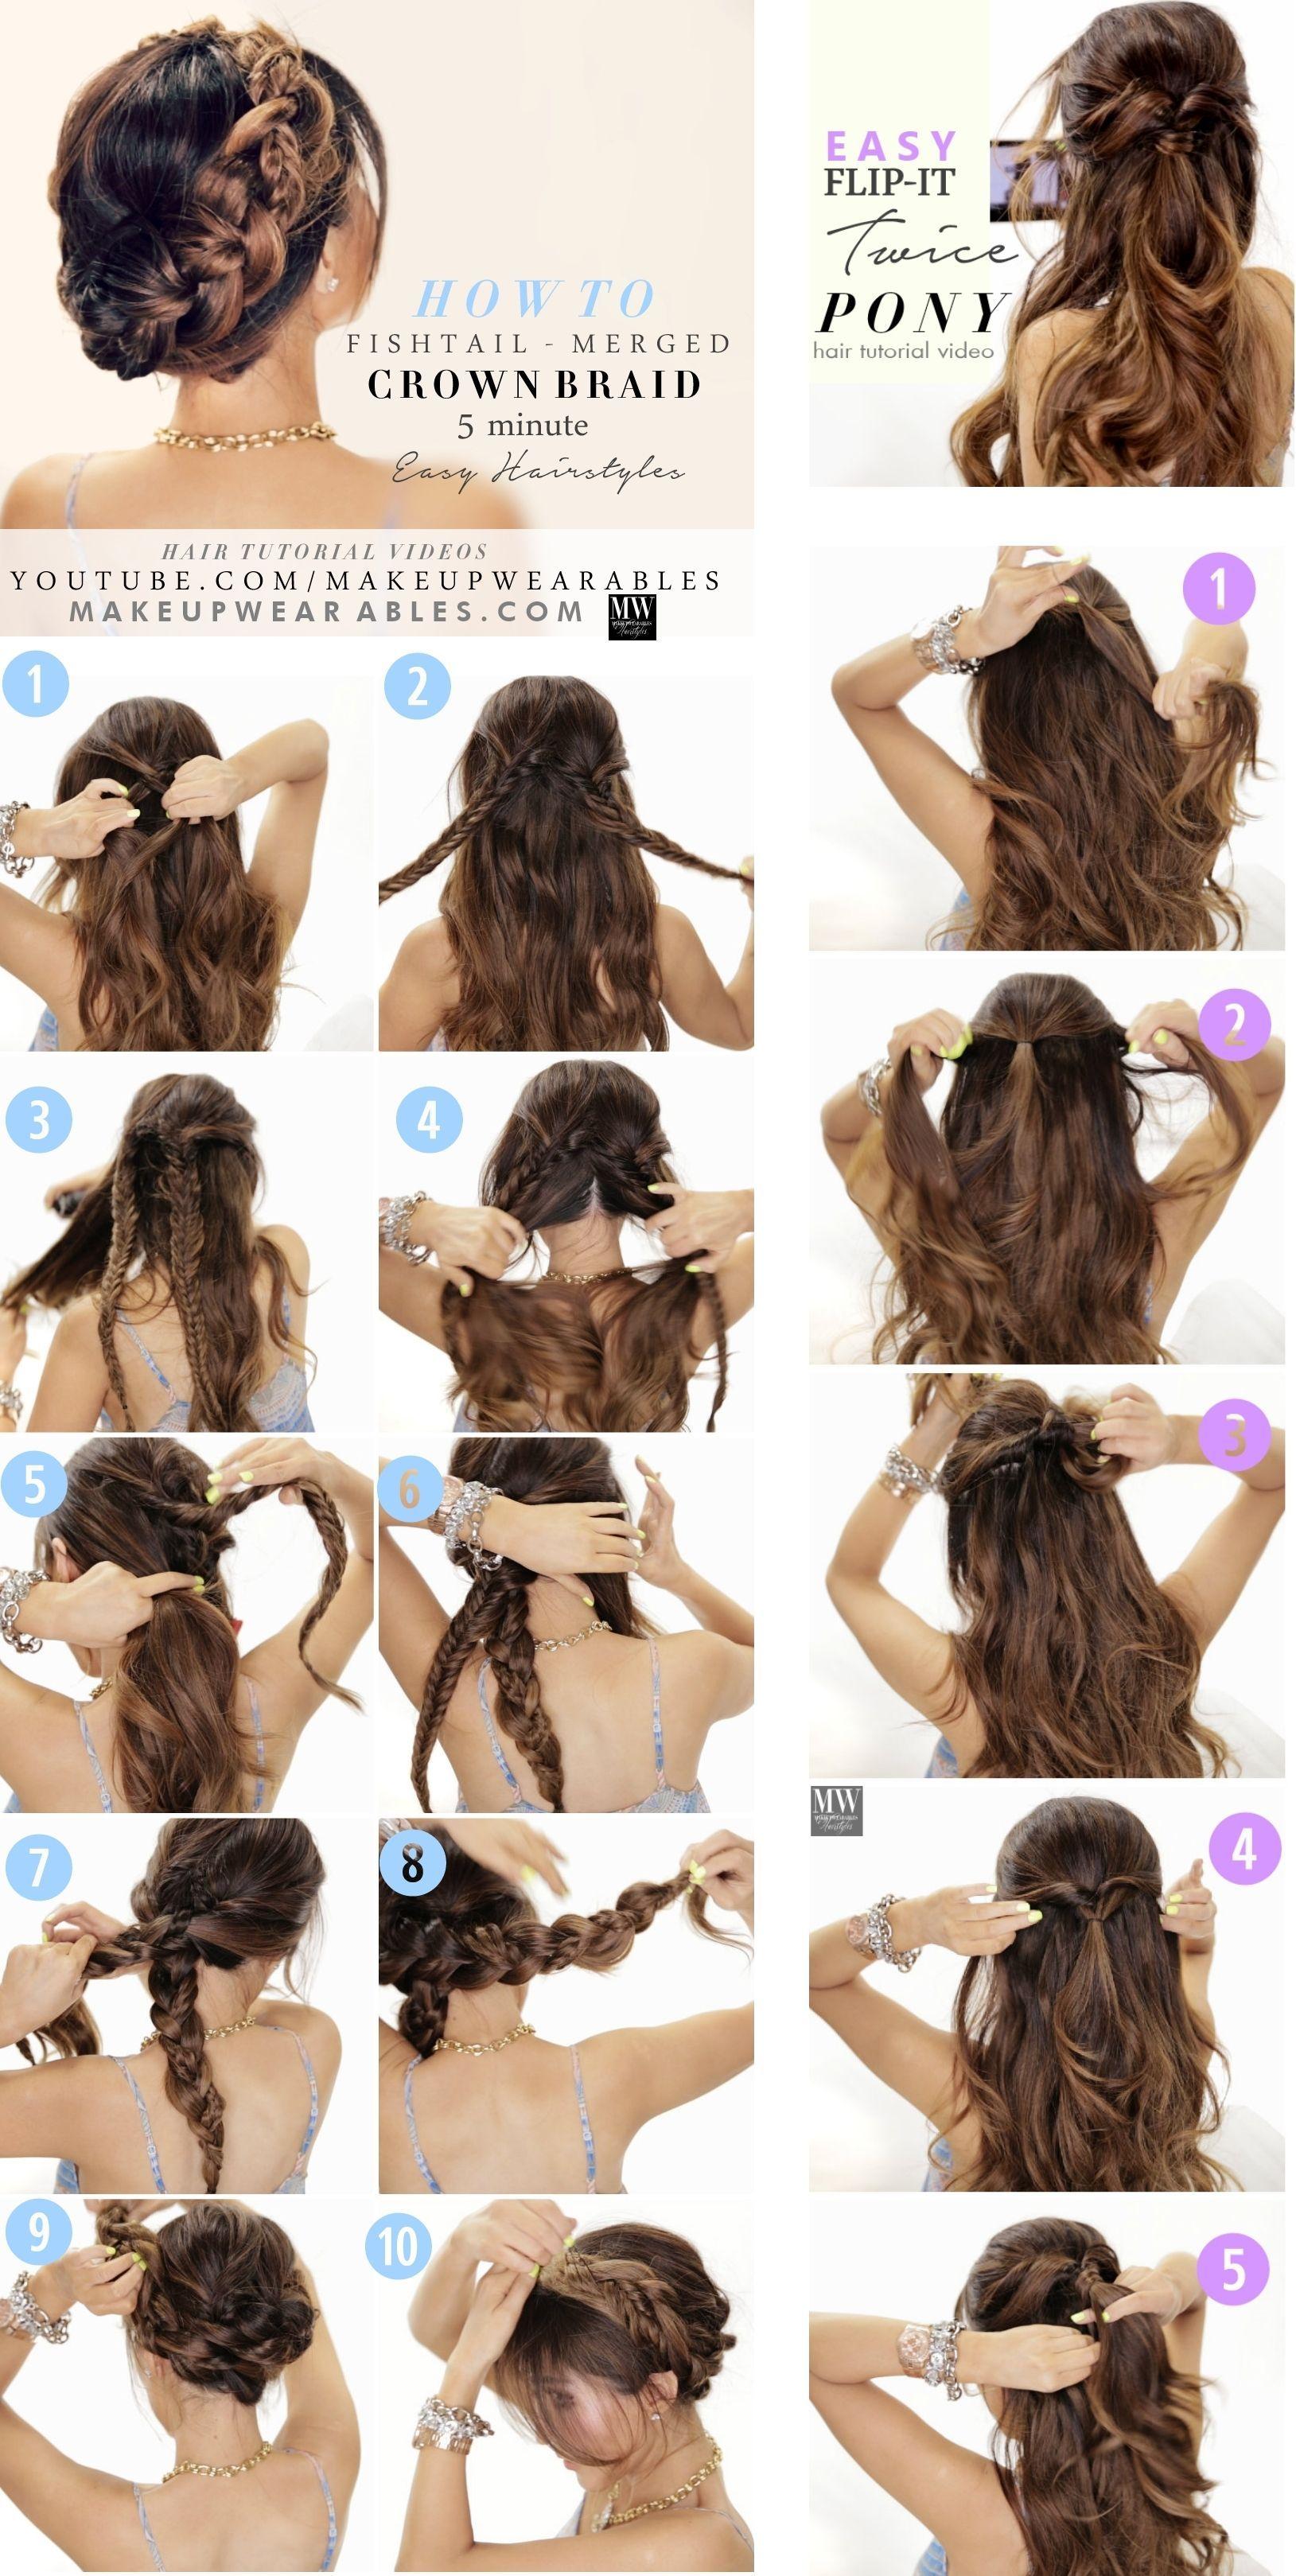 3 easy #hairstyles with merged #braids | #hair tutorial